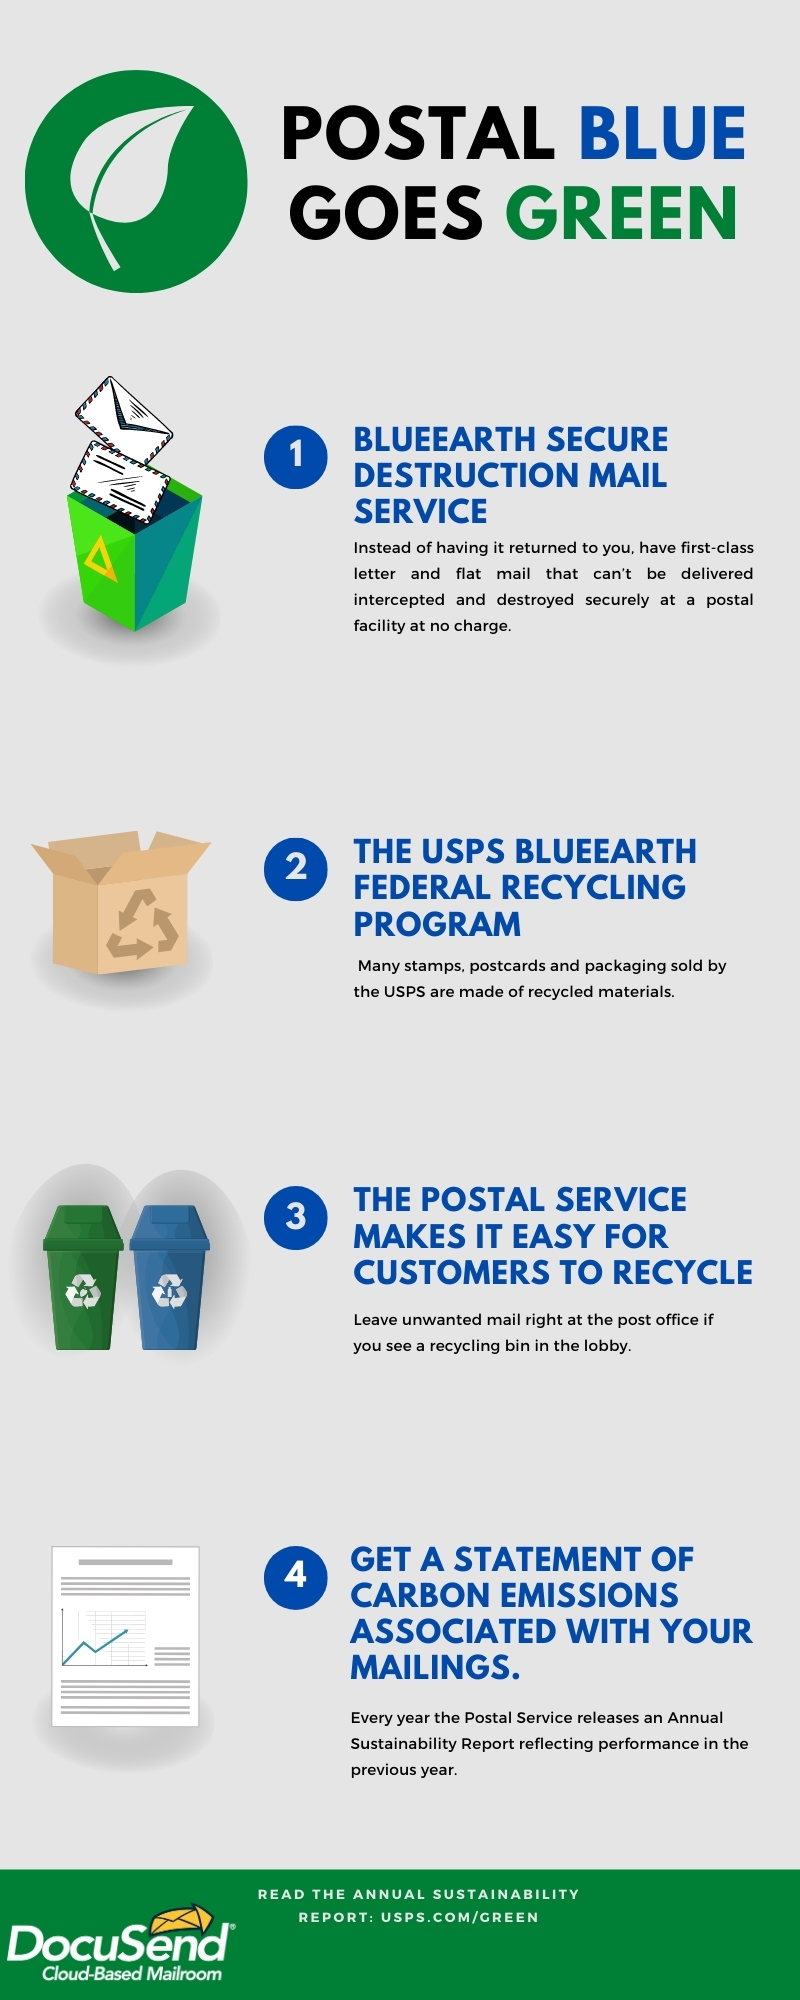 Postal Blue Goes Green